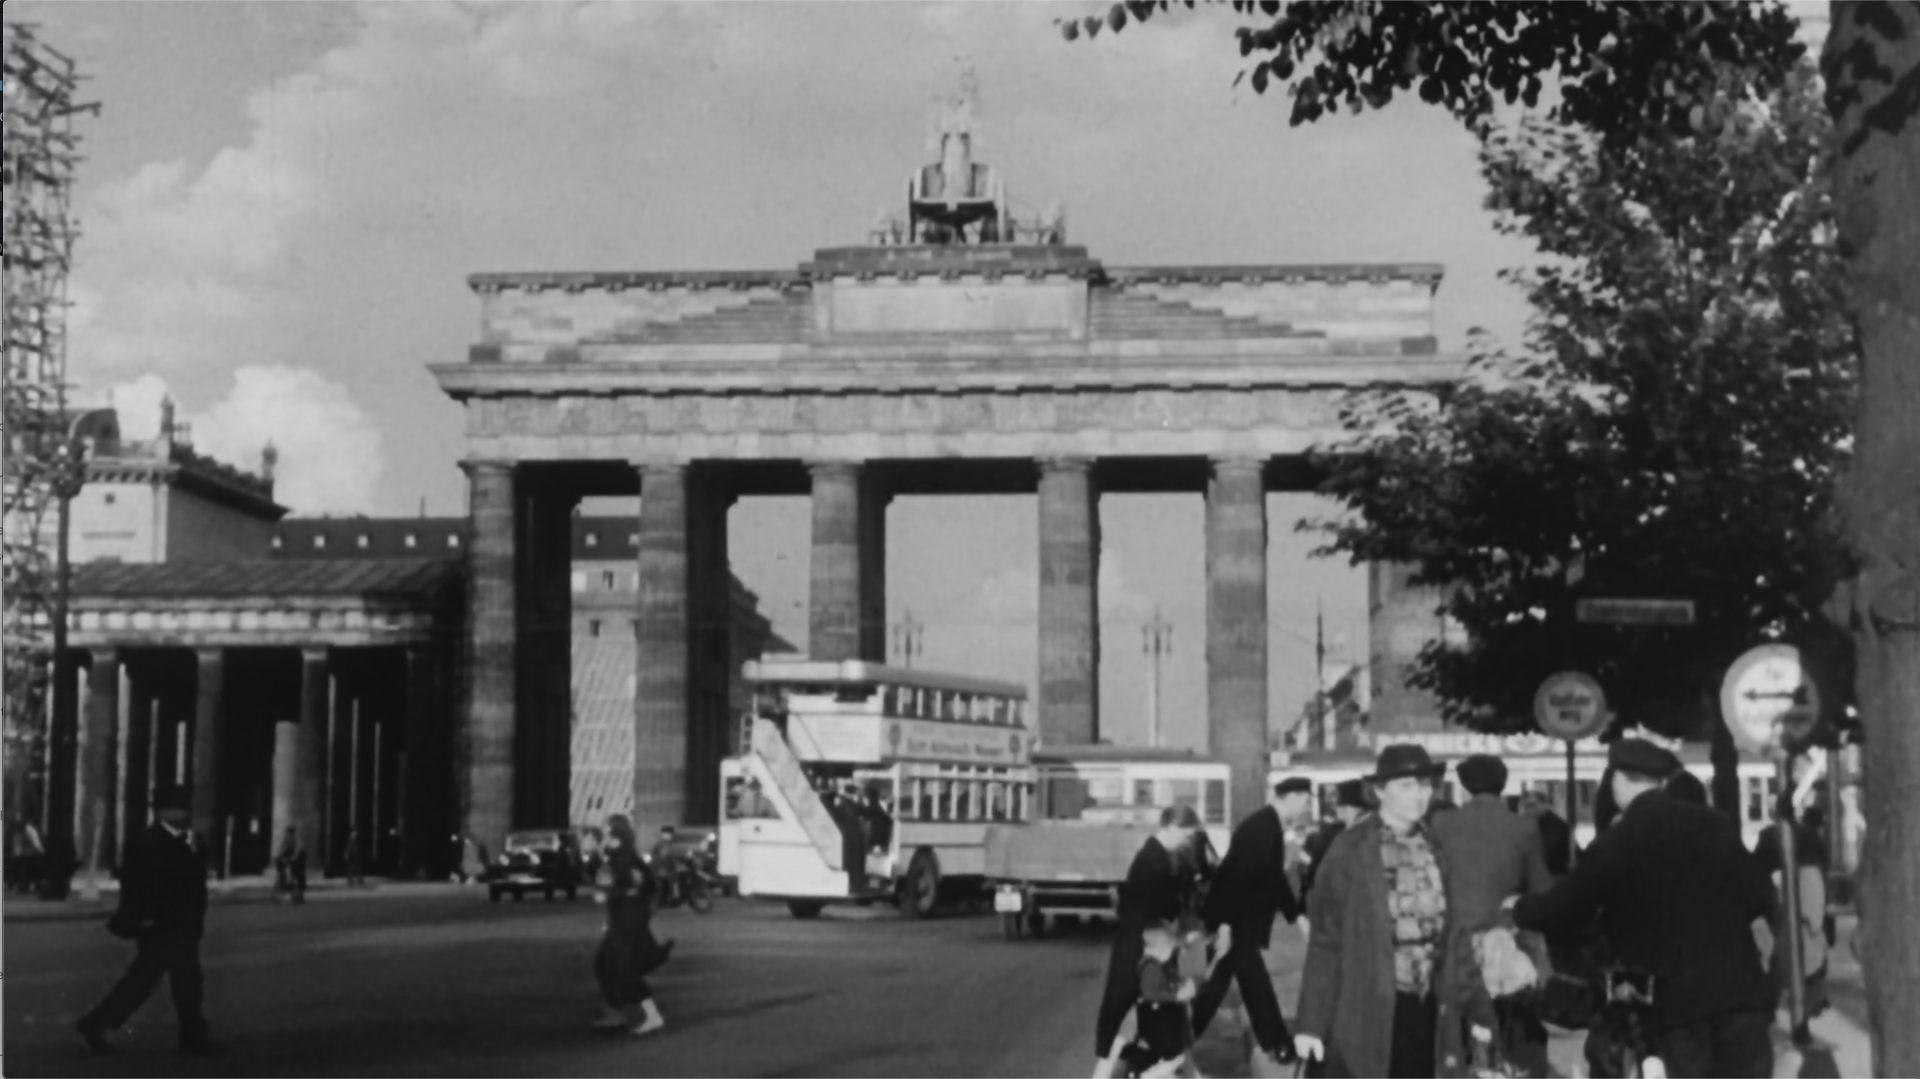 Berlin 1937